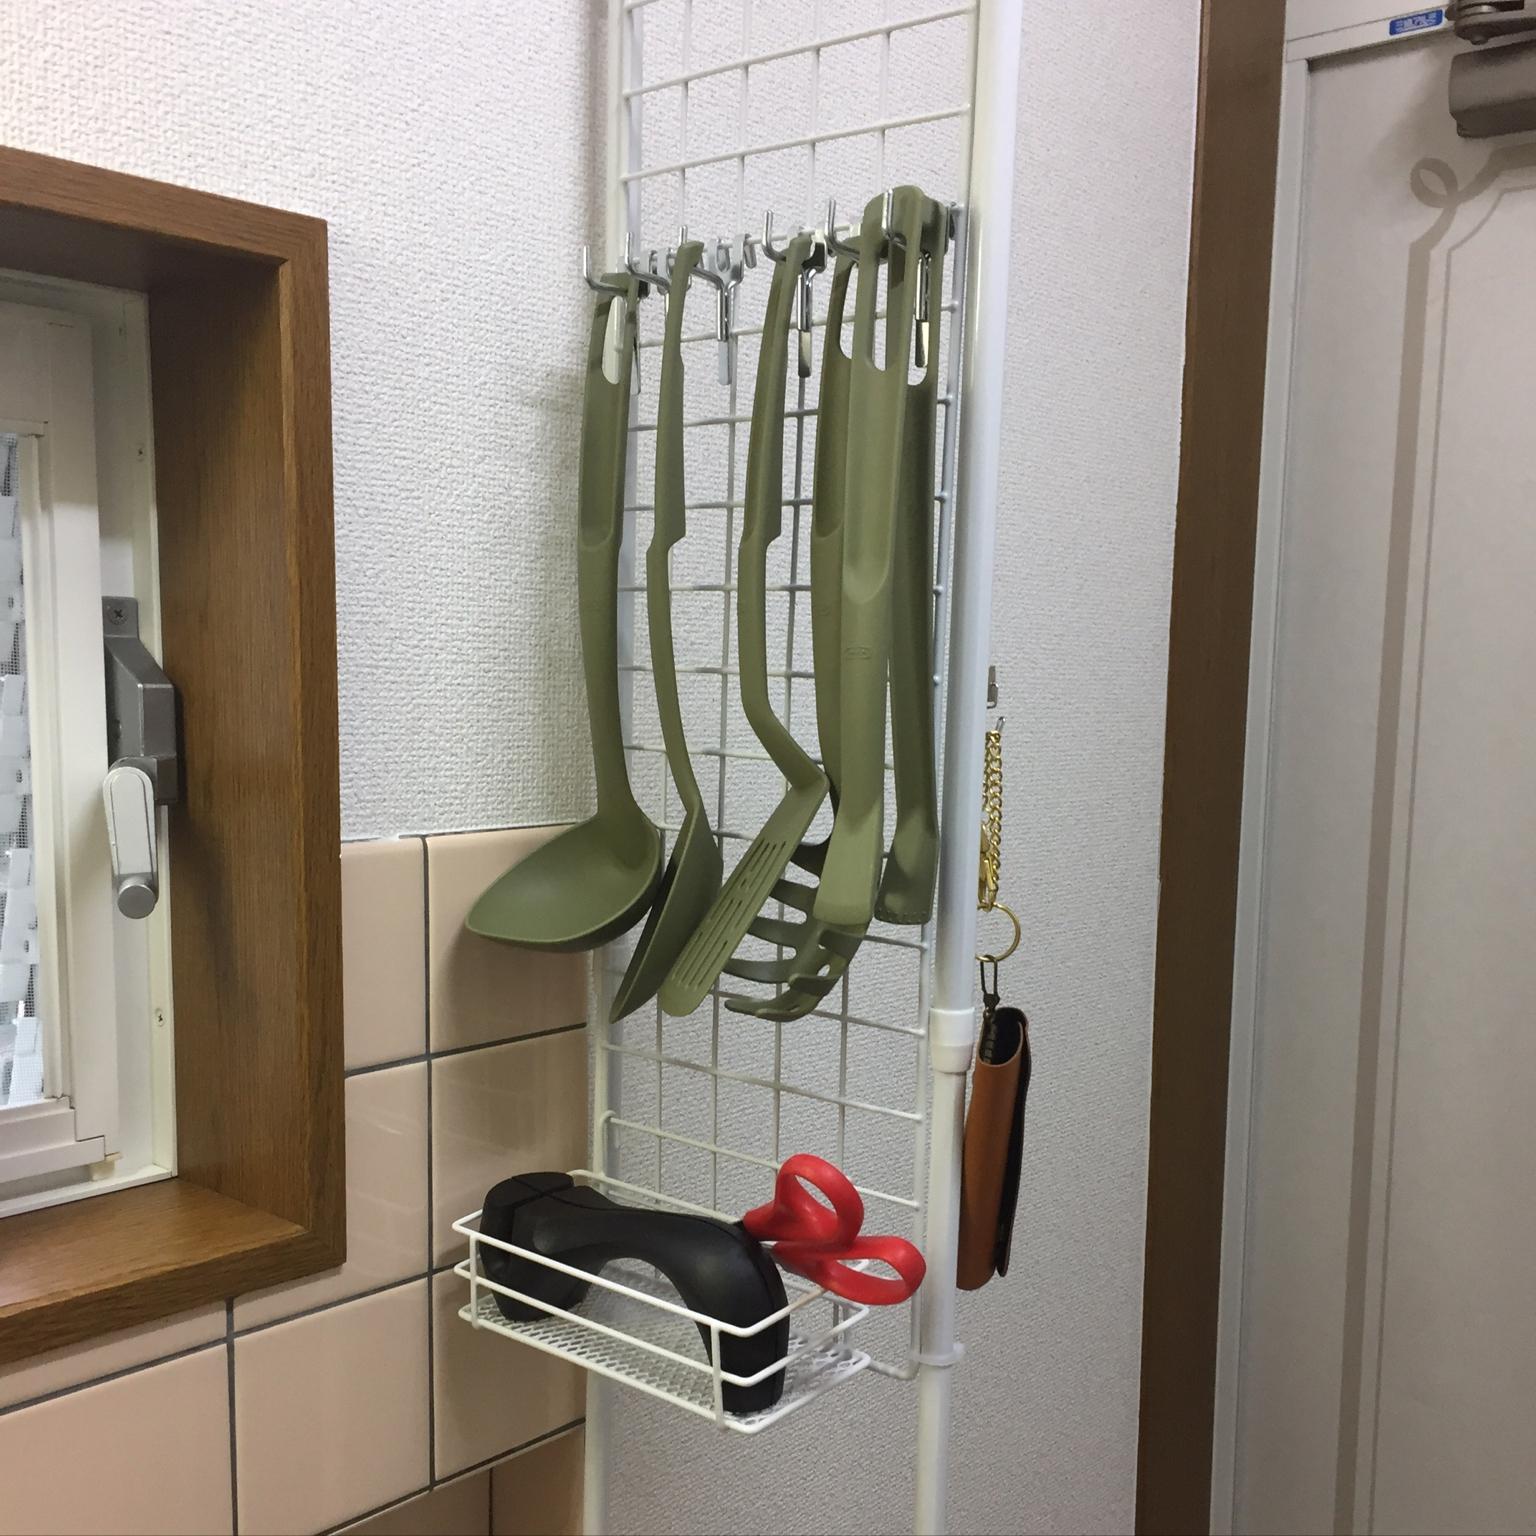 Kitchen/無印良品/ダイソー/IKEA/100均/DIY/一人暮らし/セリア/狭いキッチンに関連する部屋のインテリア実例